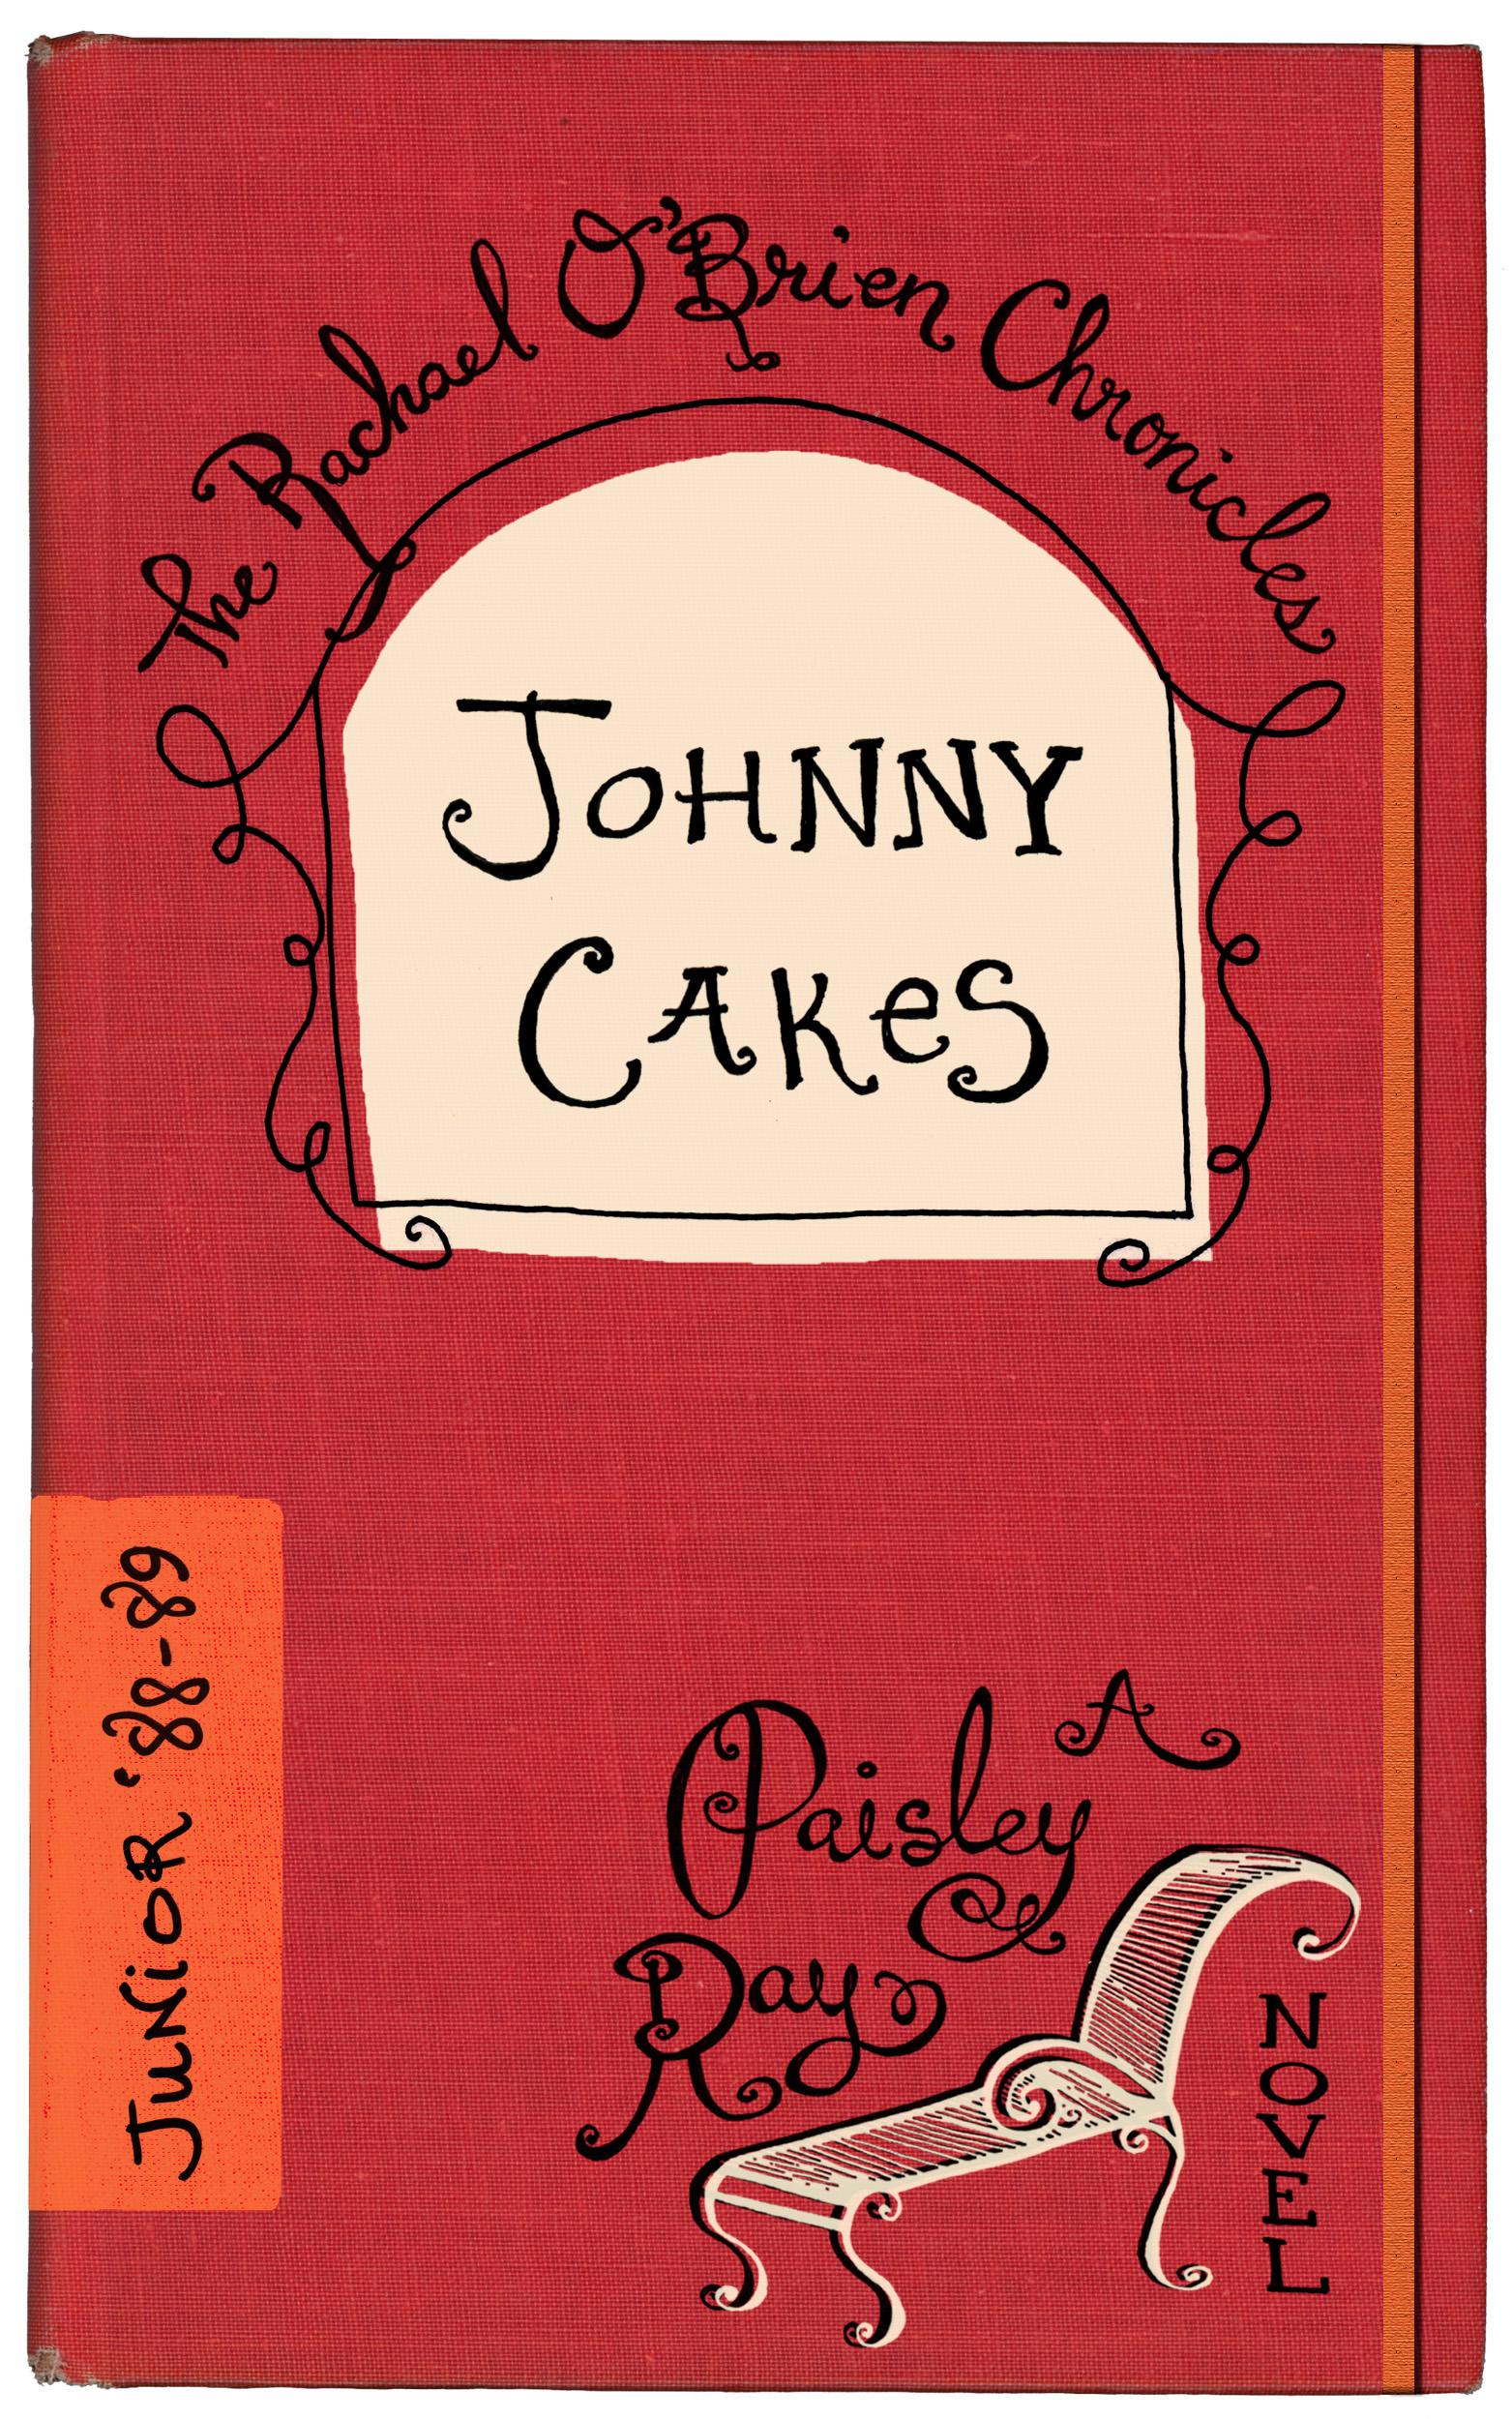 Johnny Cakes mystery book